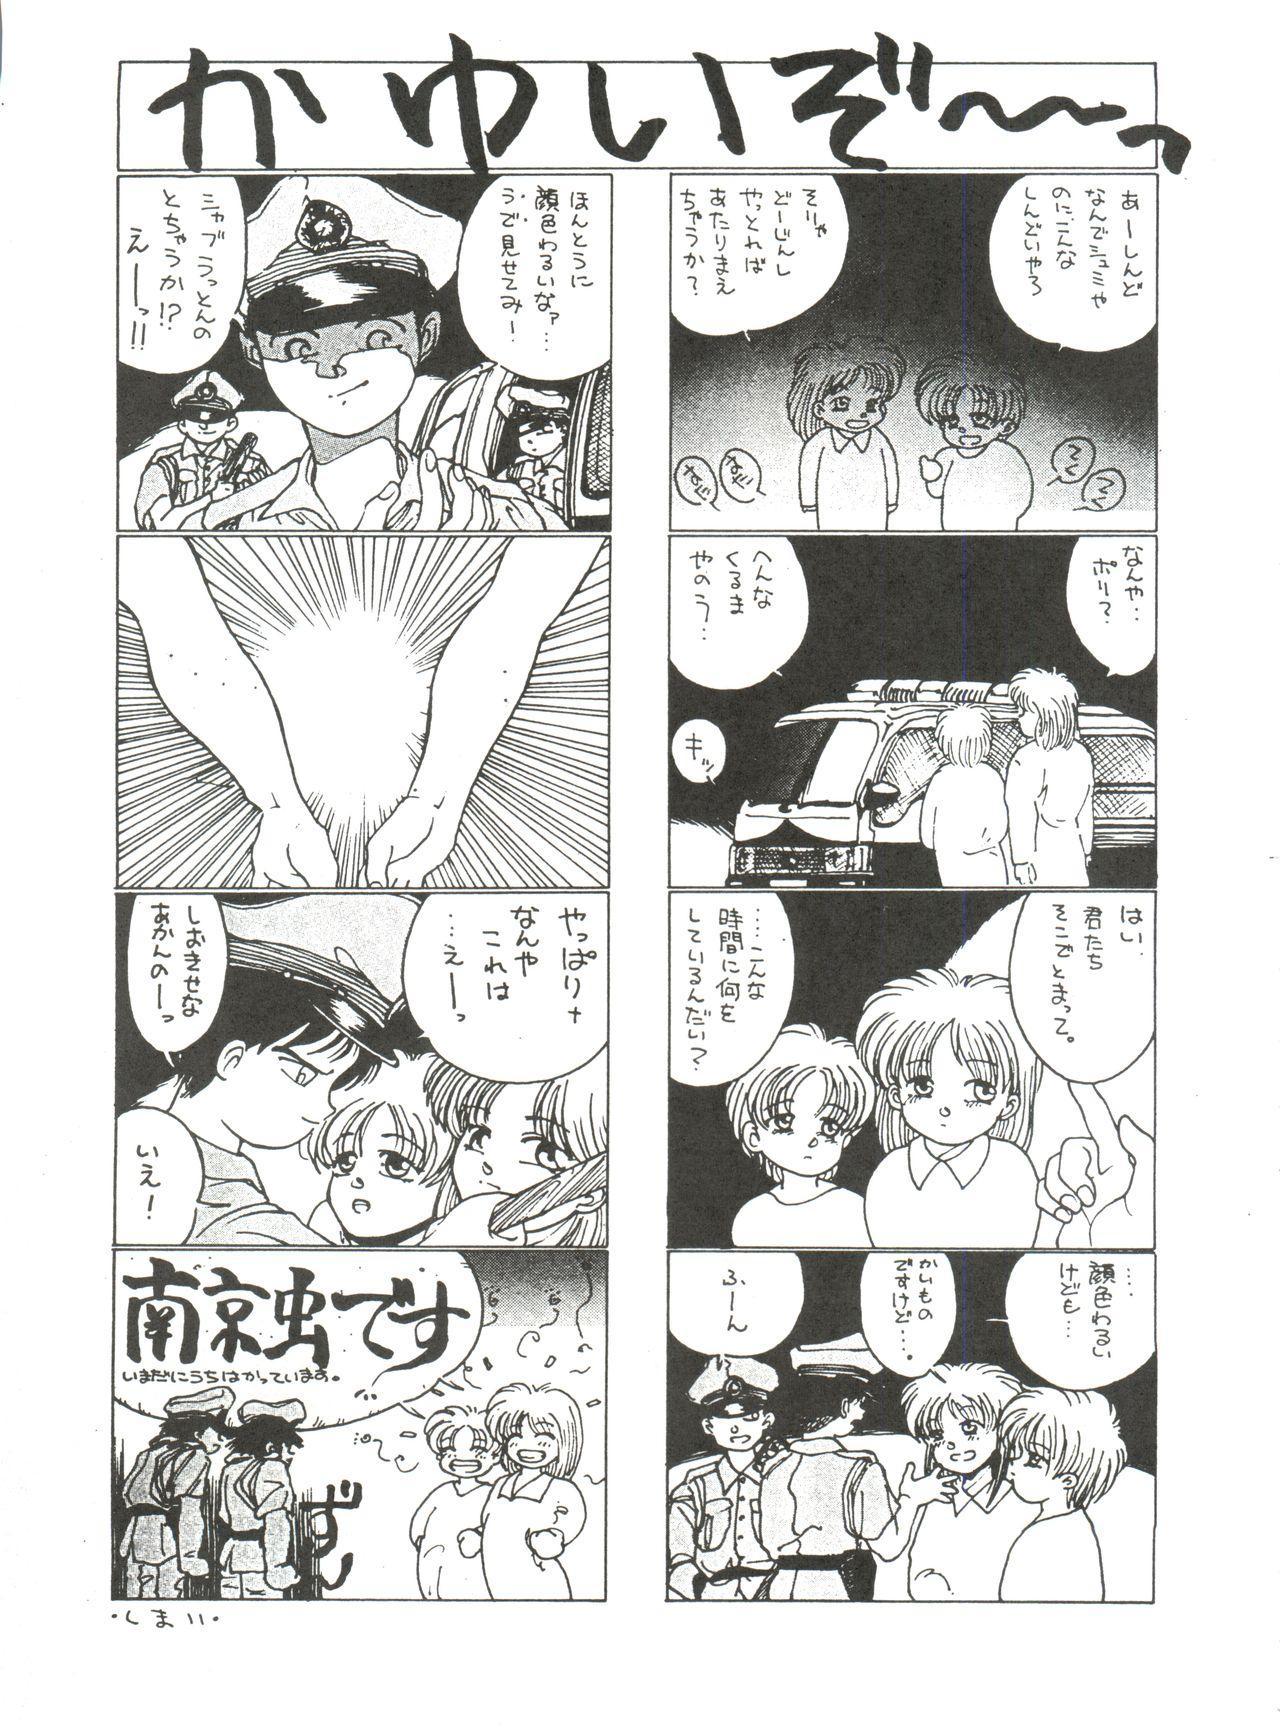 [Studio Fuck (Various) Onapet 7 (Sonic Soldier Borgman, Gundam ZZ, Osomatsu-kun) 4